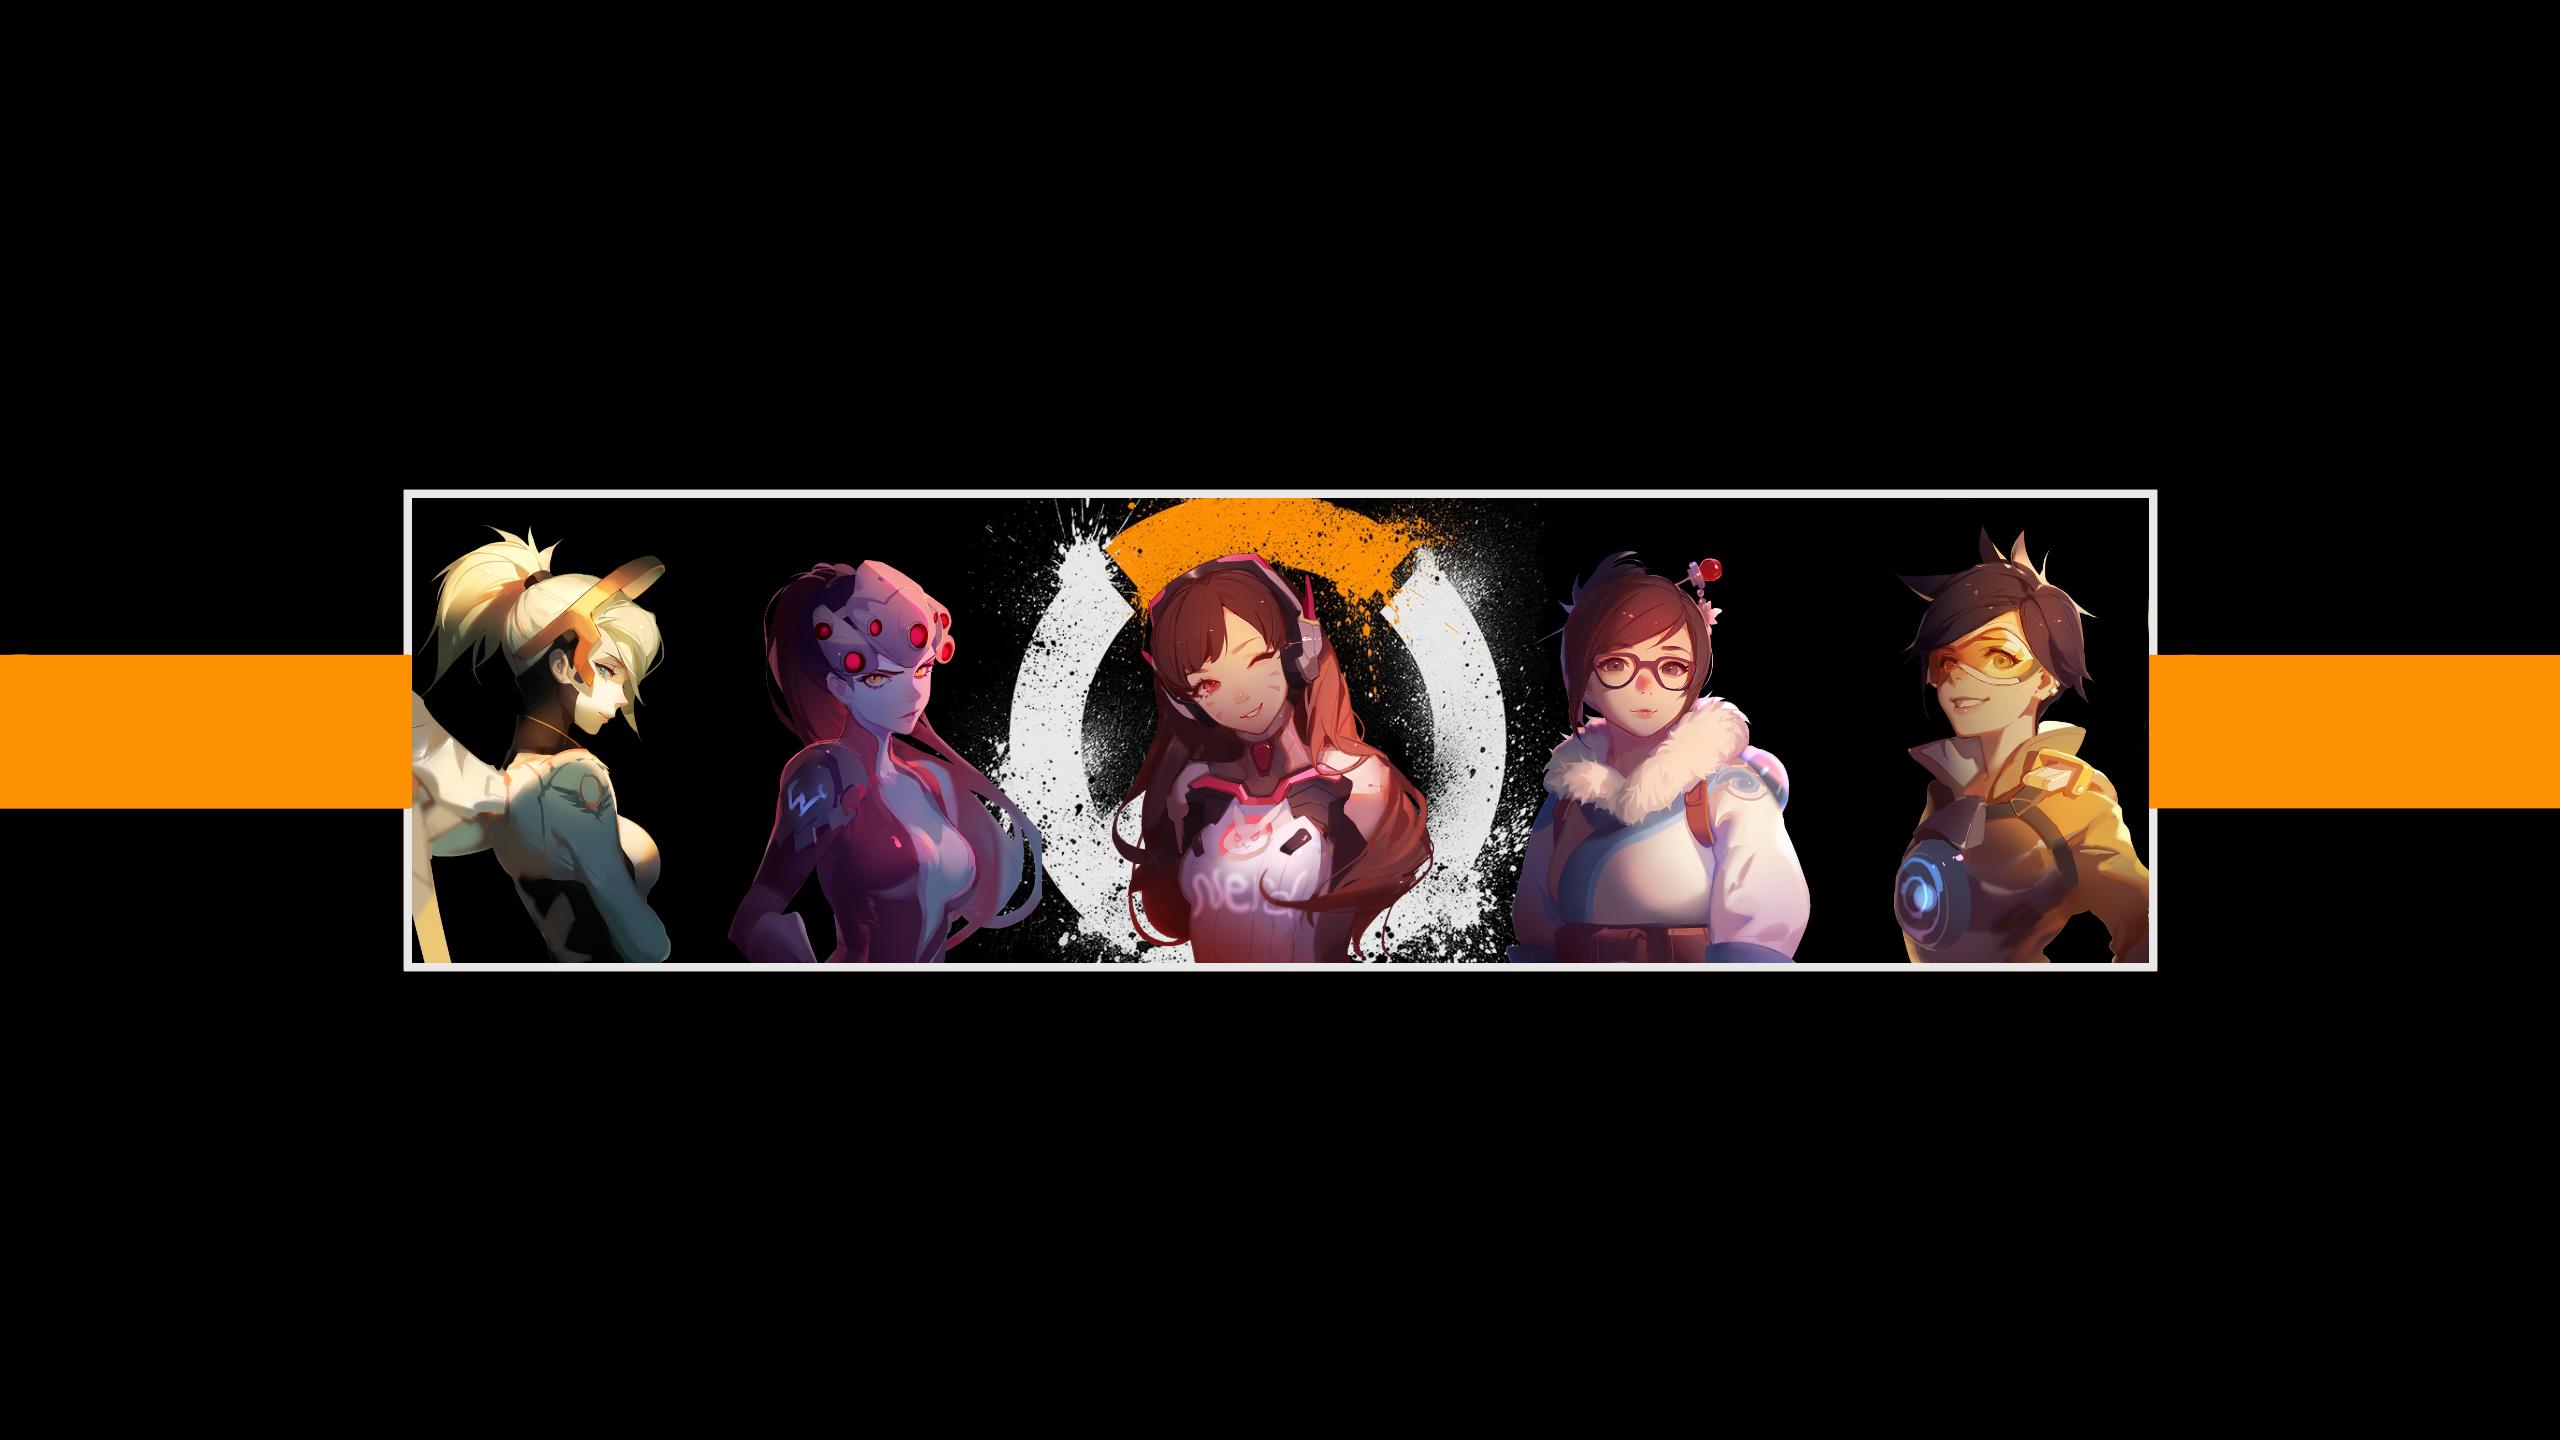 D wallpaper just playing games gg by lowkey nerd on deviantart overwatch girl heroes desktop wallpaper nerd by lowkey nerd voltagebd Choice Image